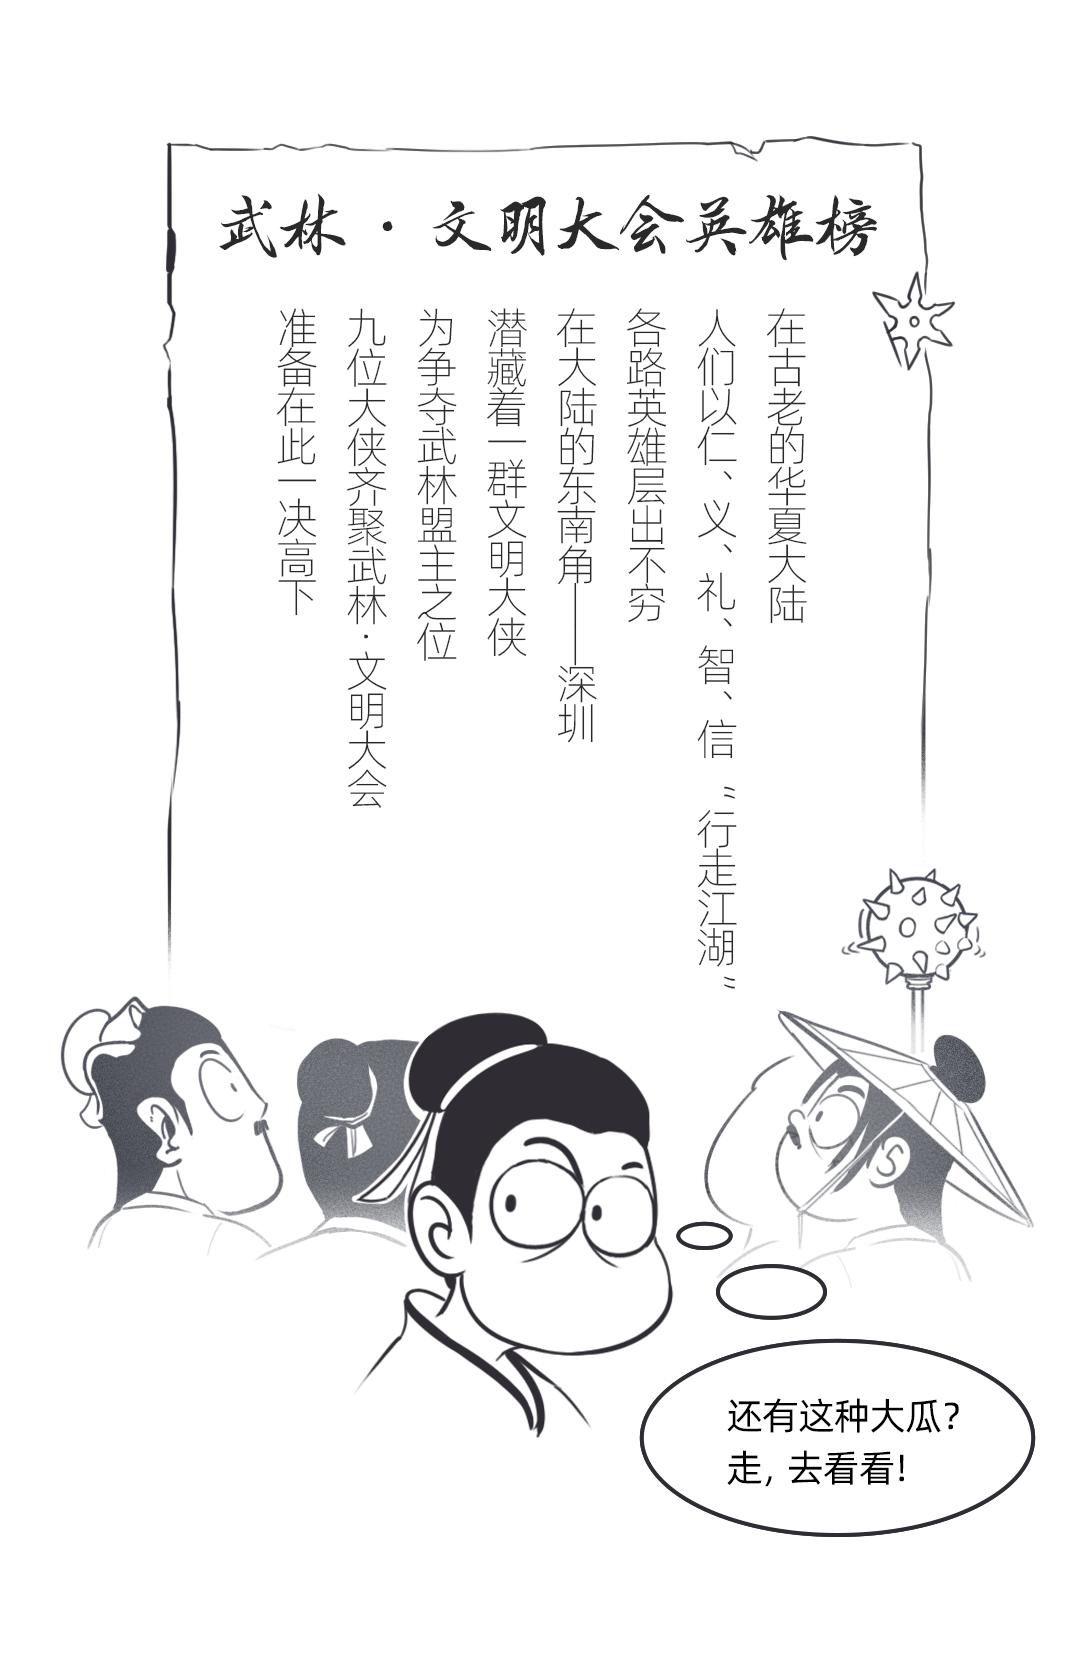 笑傲江胡第二张02.png